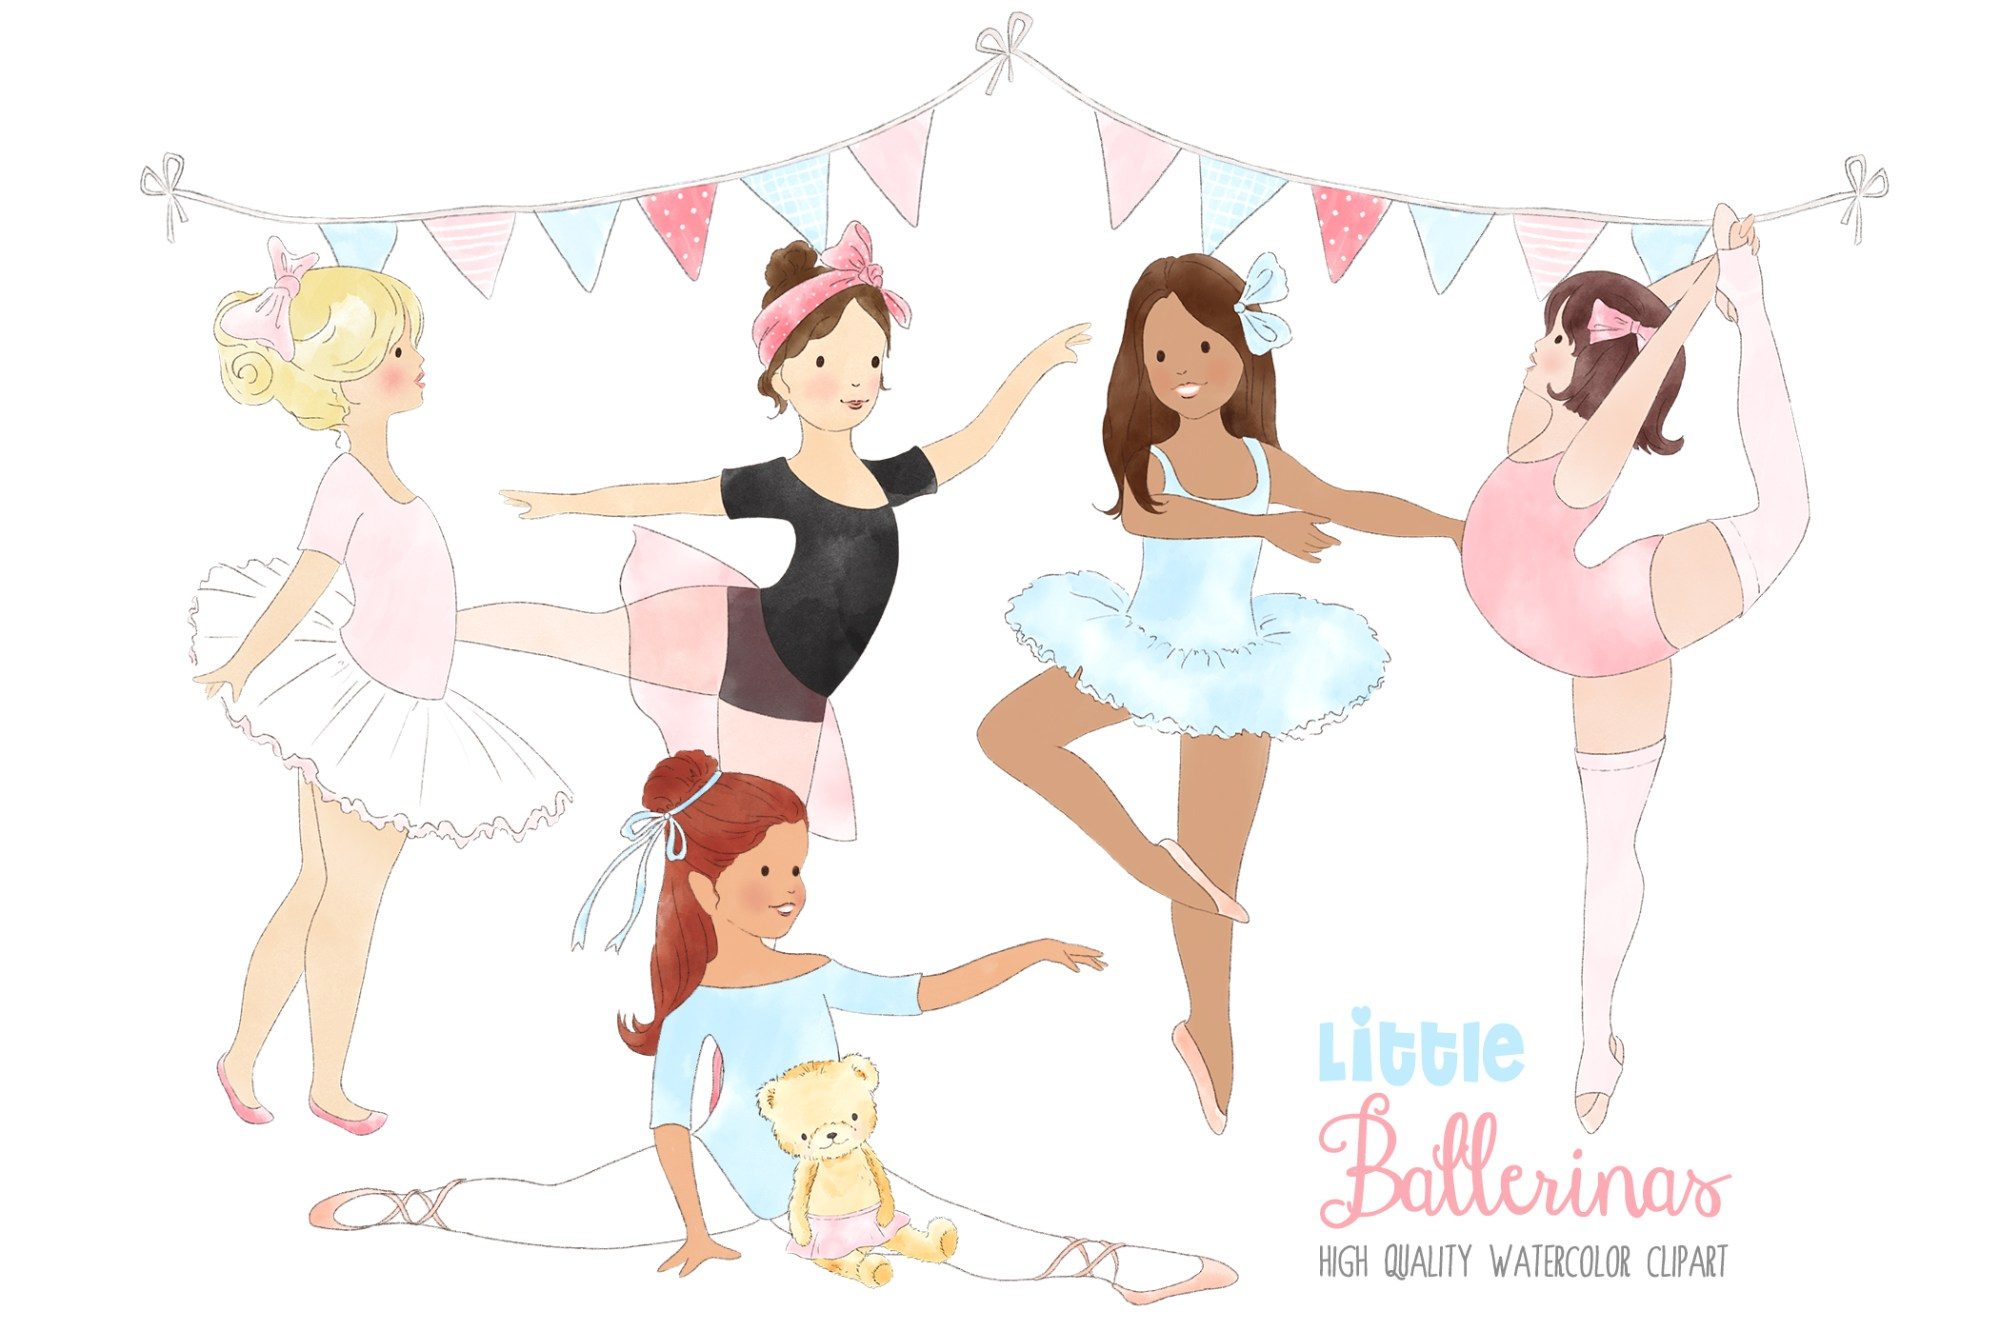 hight resolution of ballerinas ballet dancing girl clipart graphic by kabankova creative fabrica